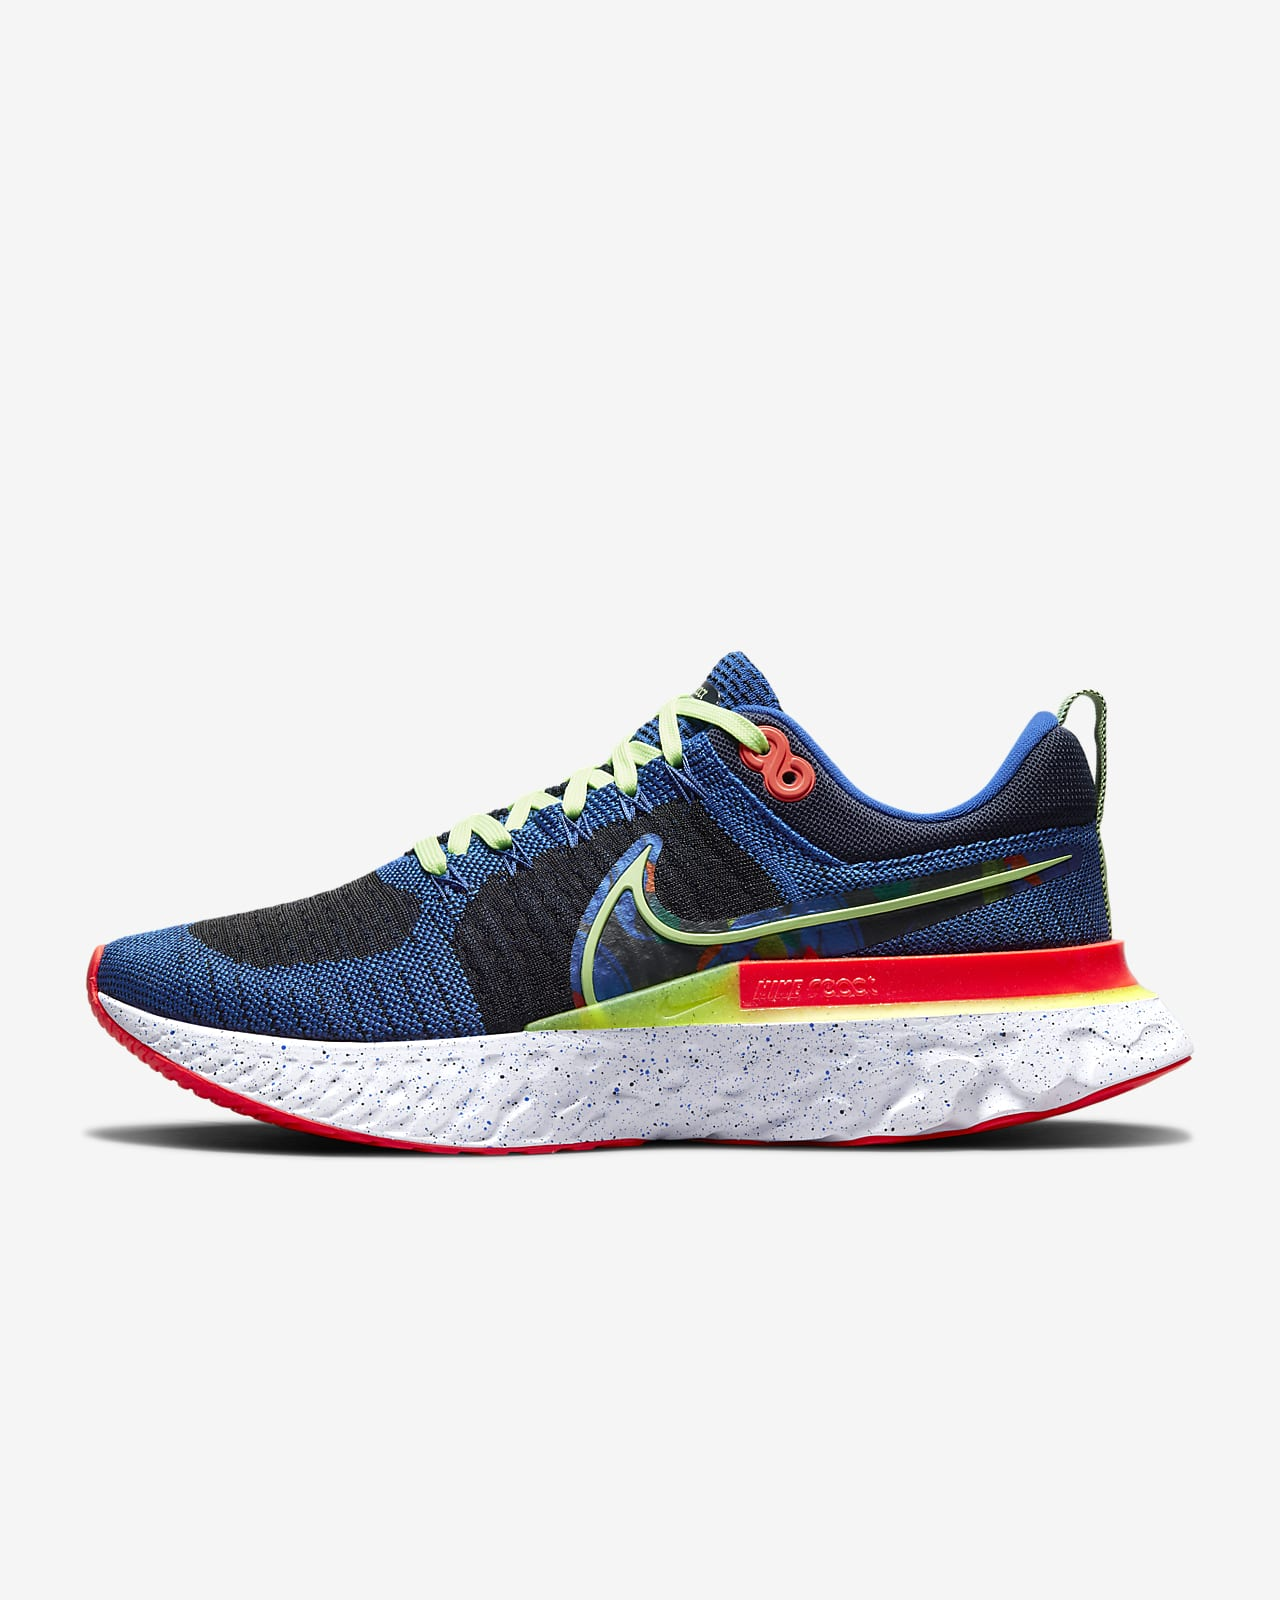 Мужские беговые кроссовки Nike React Infinity Run Flyknit 2 A.I.R. Kelly Anna London